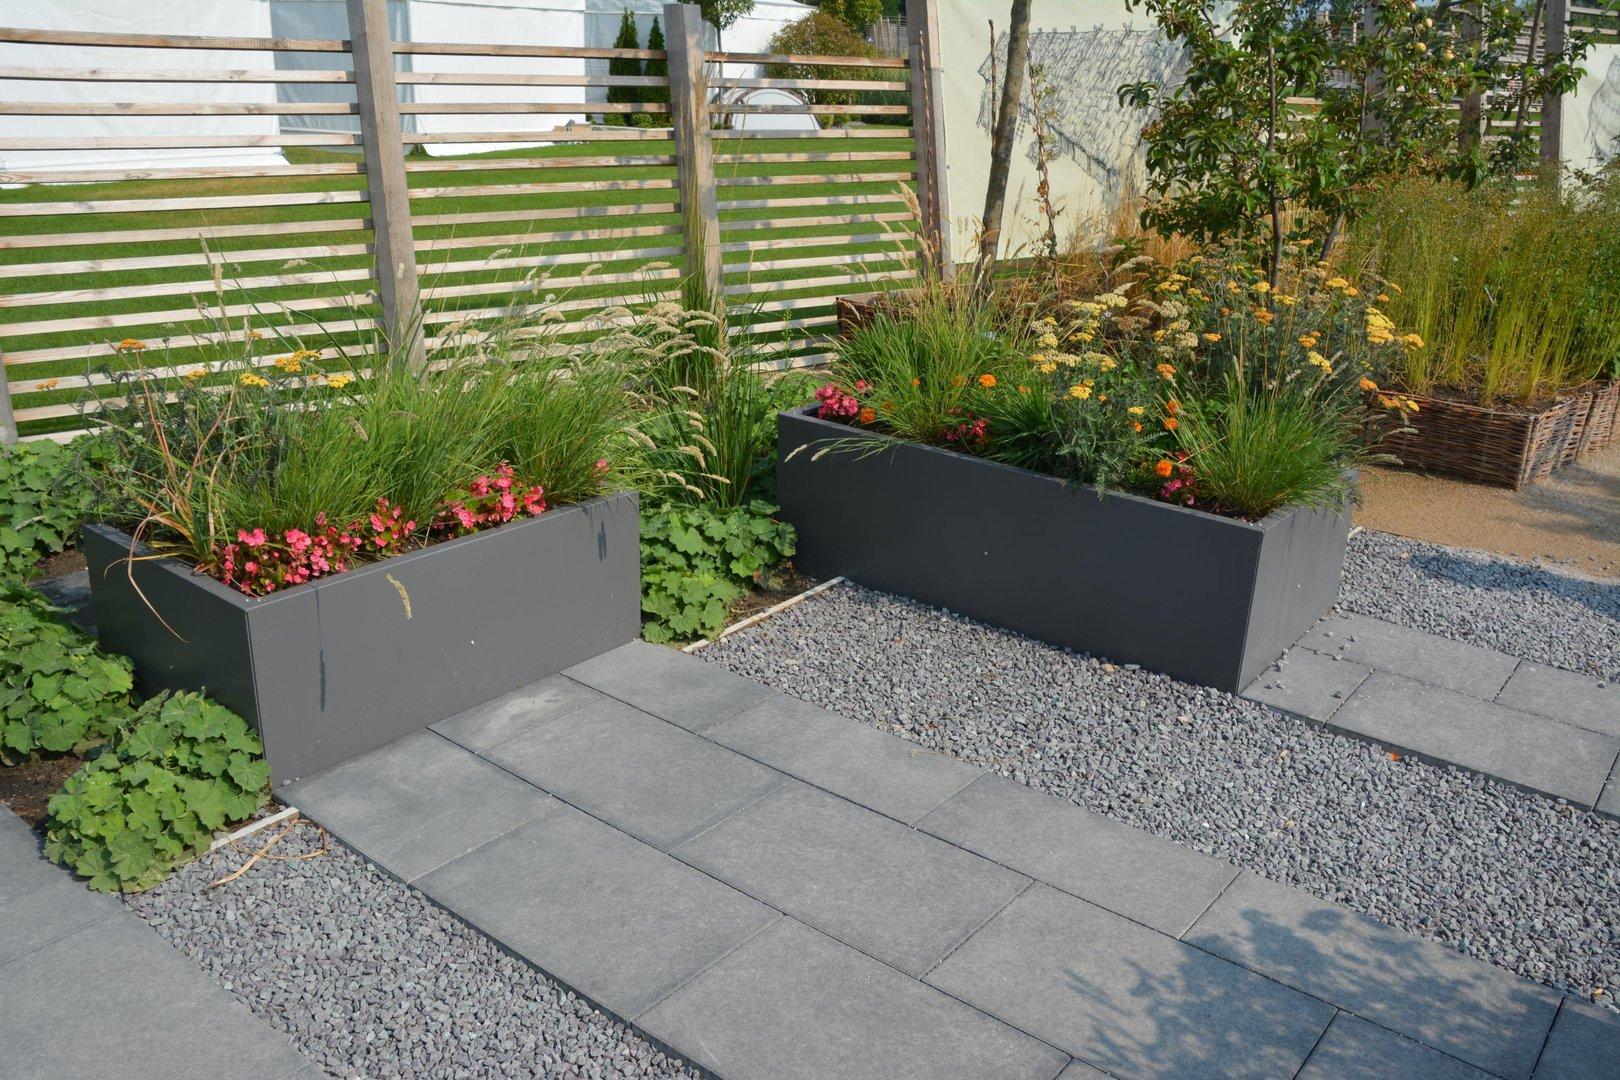 Hochbeet urban aus metall 1 1 m x 0 55 m x 0 5 m beschichtet for Gartengestaltung urban